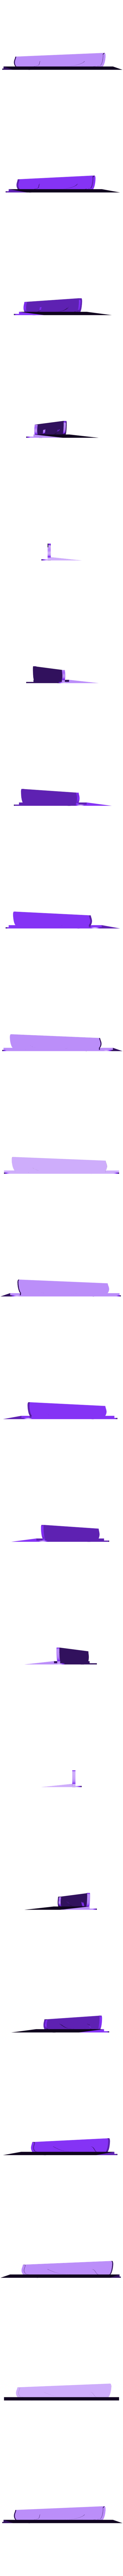 Stand_02.stl Download free STL file Mr. Natural -  R Crumb • 3D printer object, JayOmega